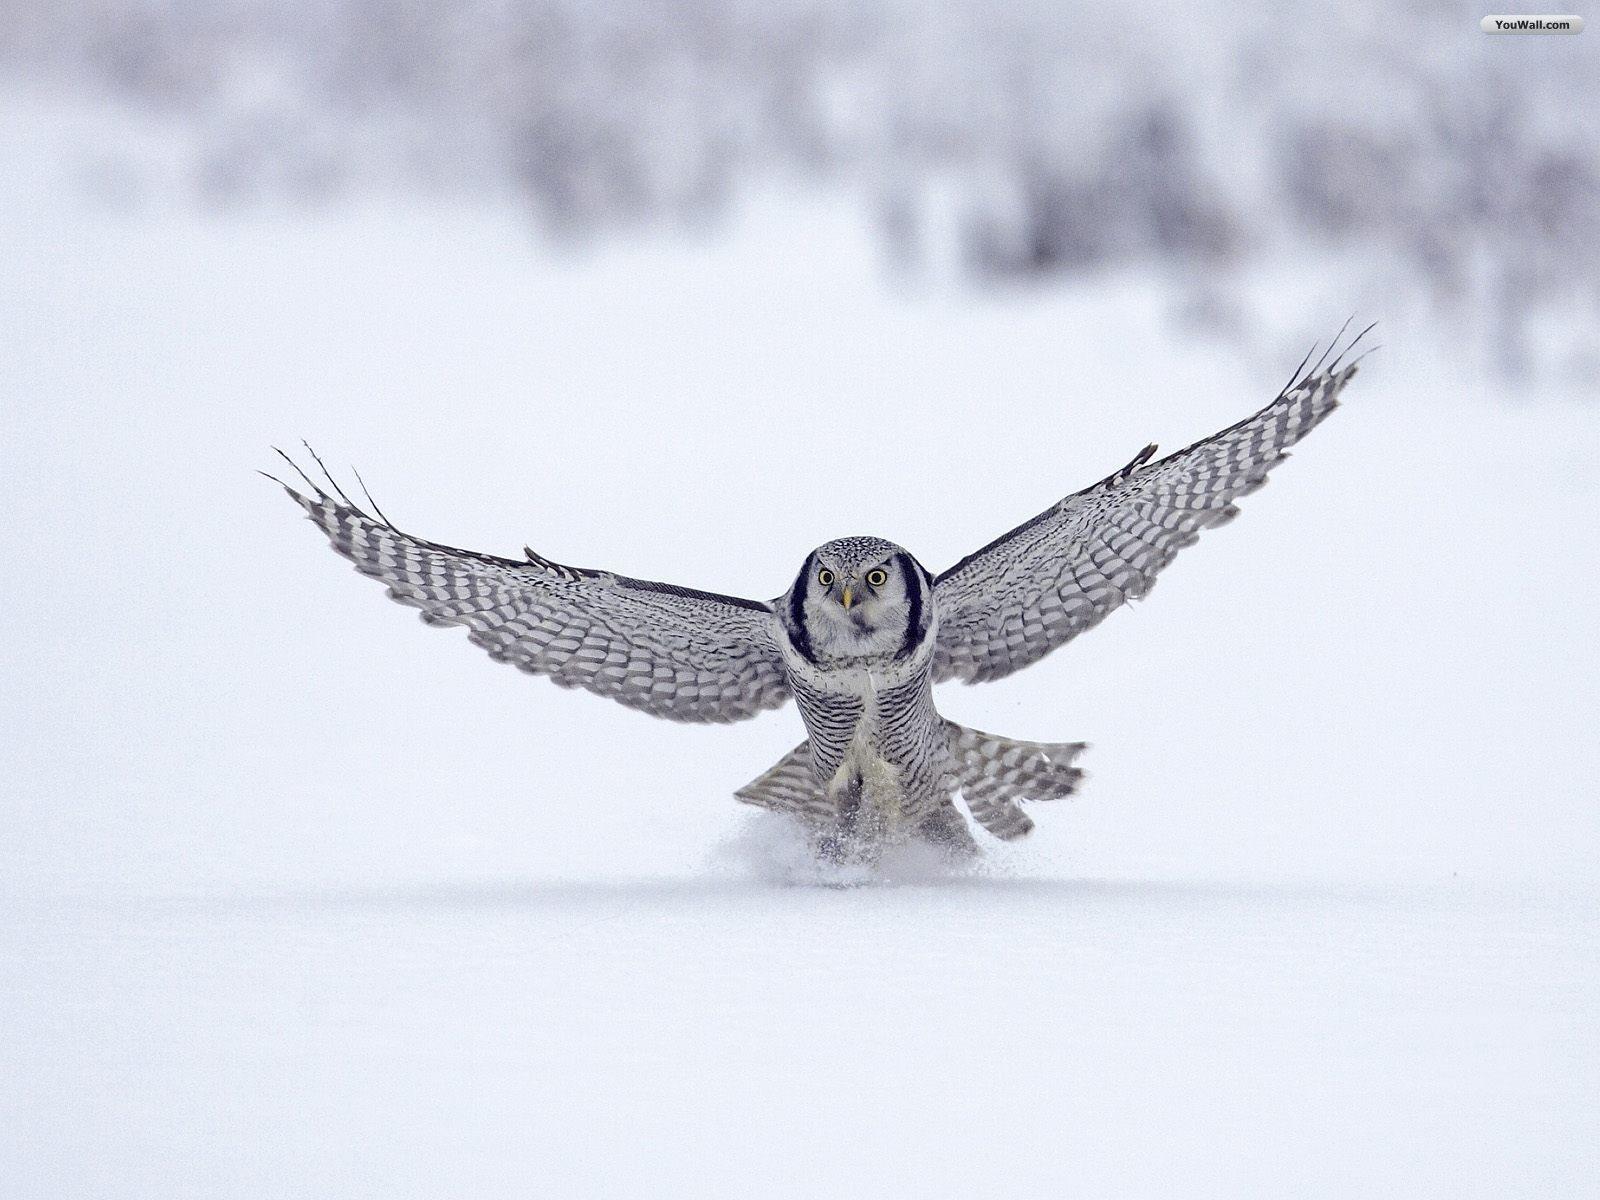 YouWall   Flying Owl Wallpaper   wallpaperwallpapersfree wallpaper 1600x1200